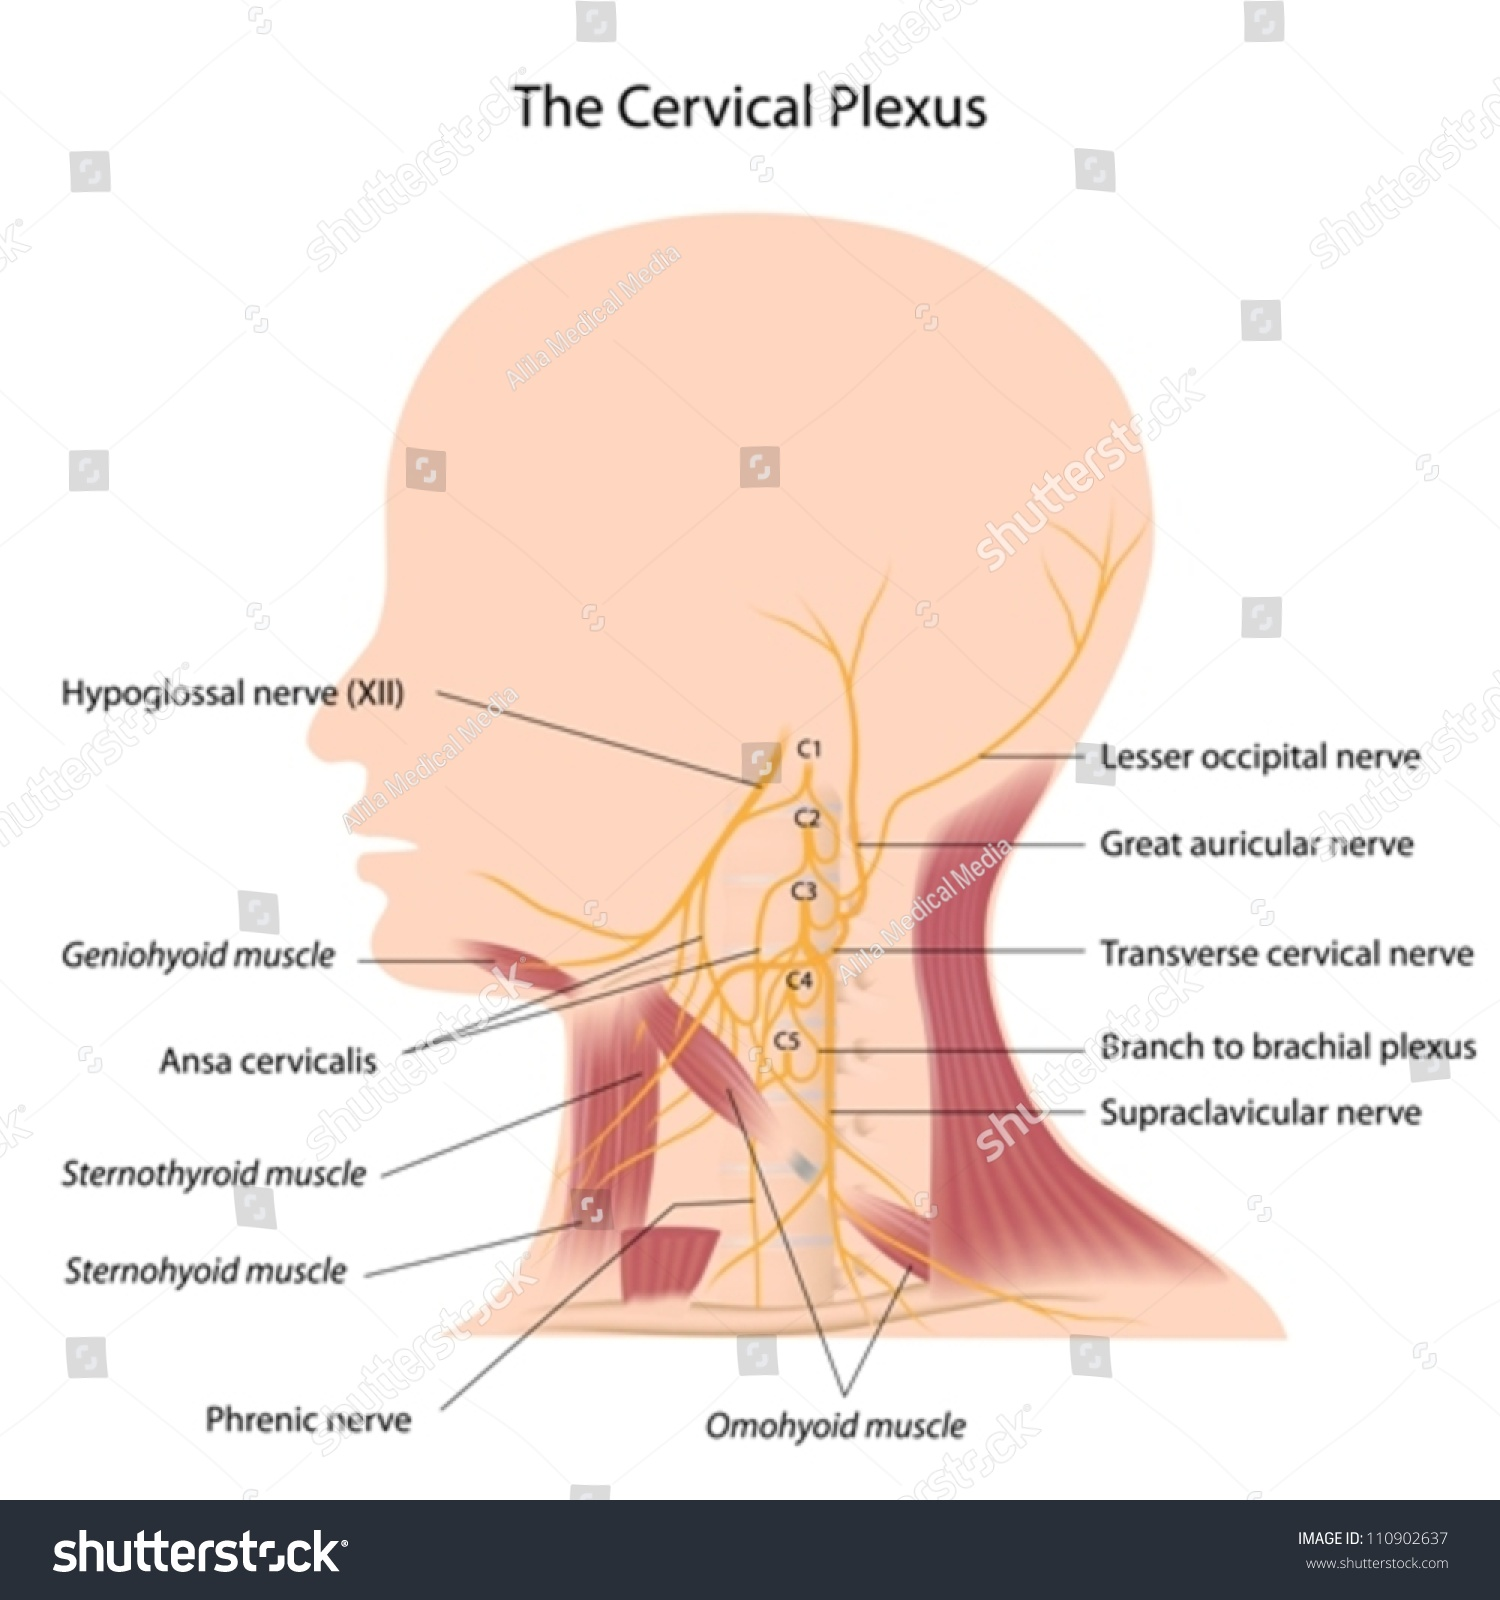 Cervical Plexus Stock Photo Photo Vector Illustration 110902637